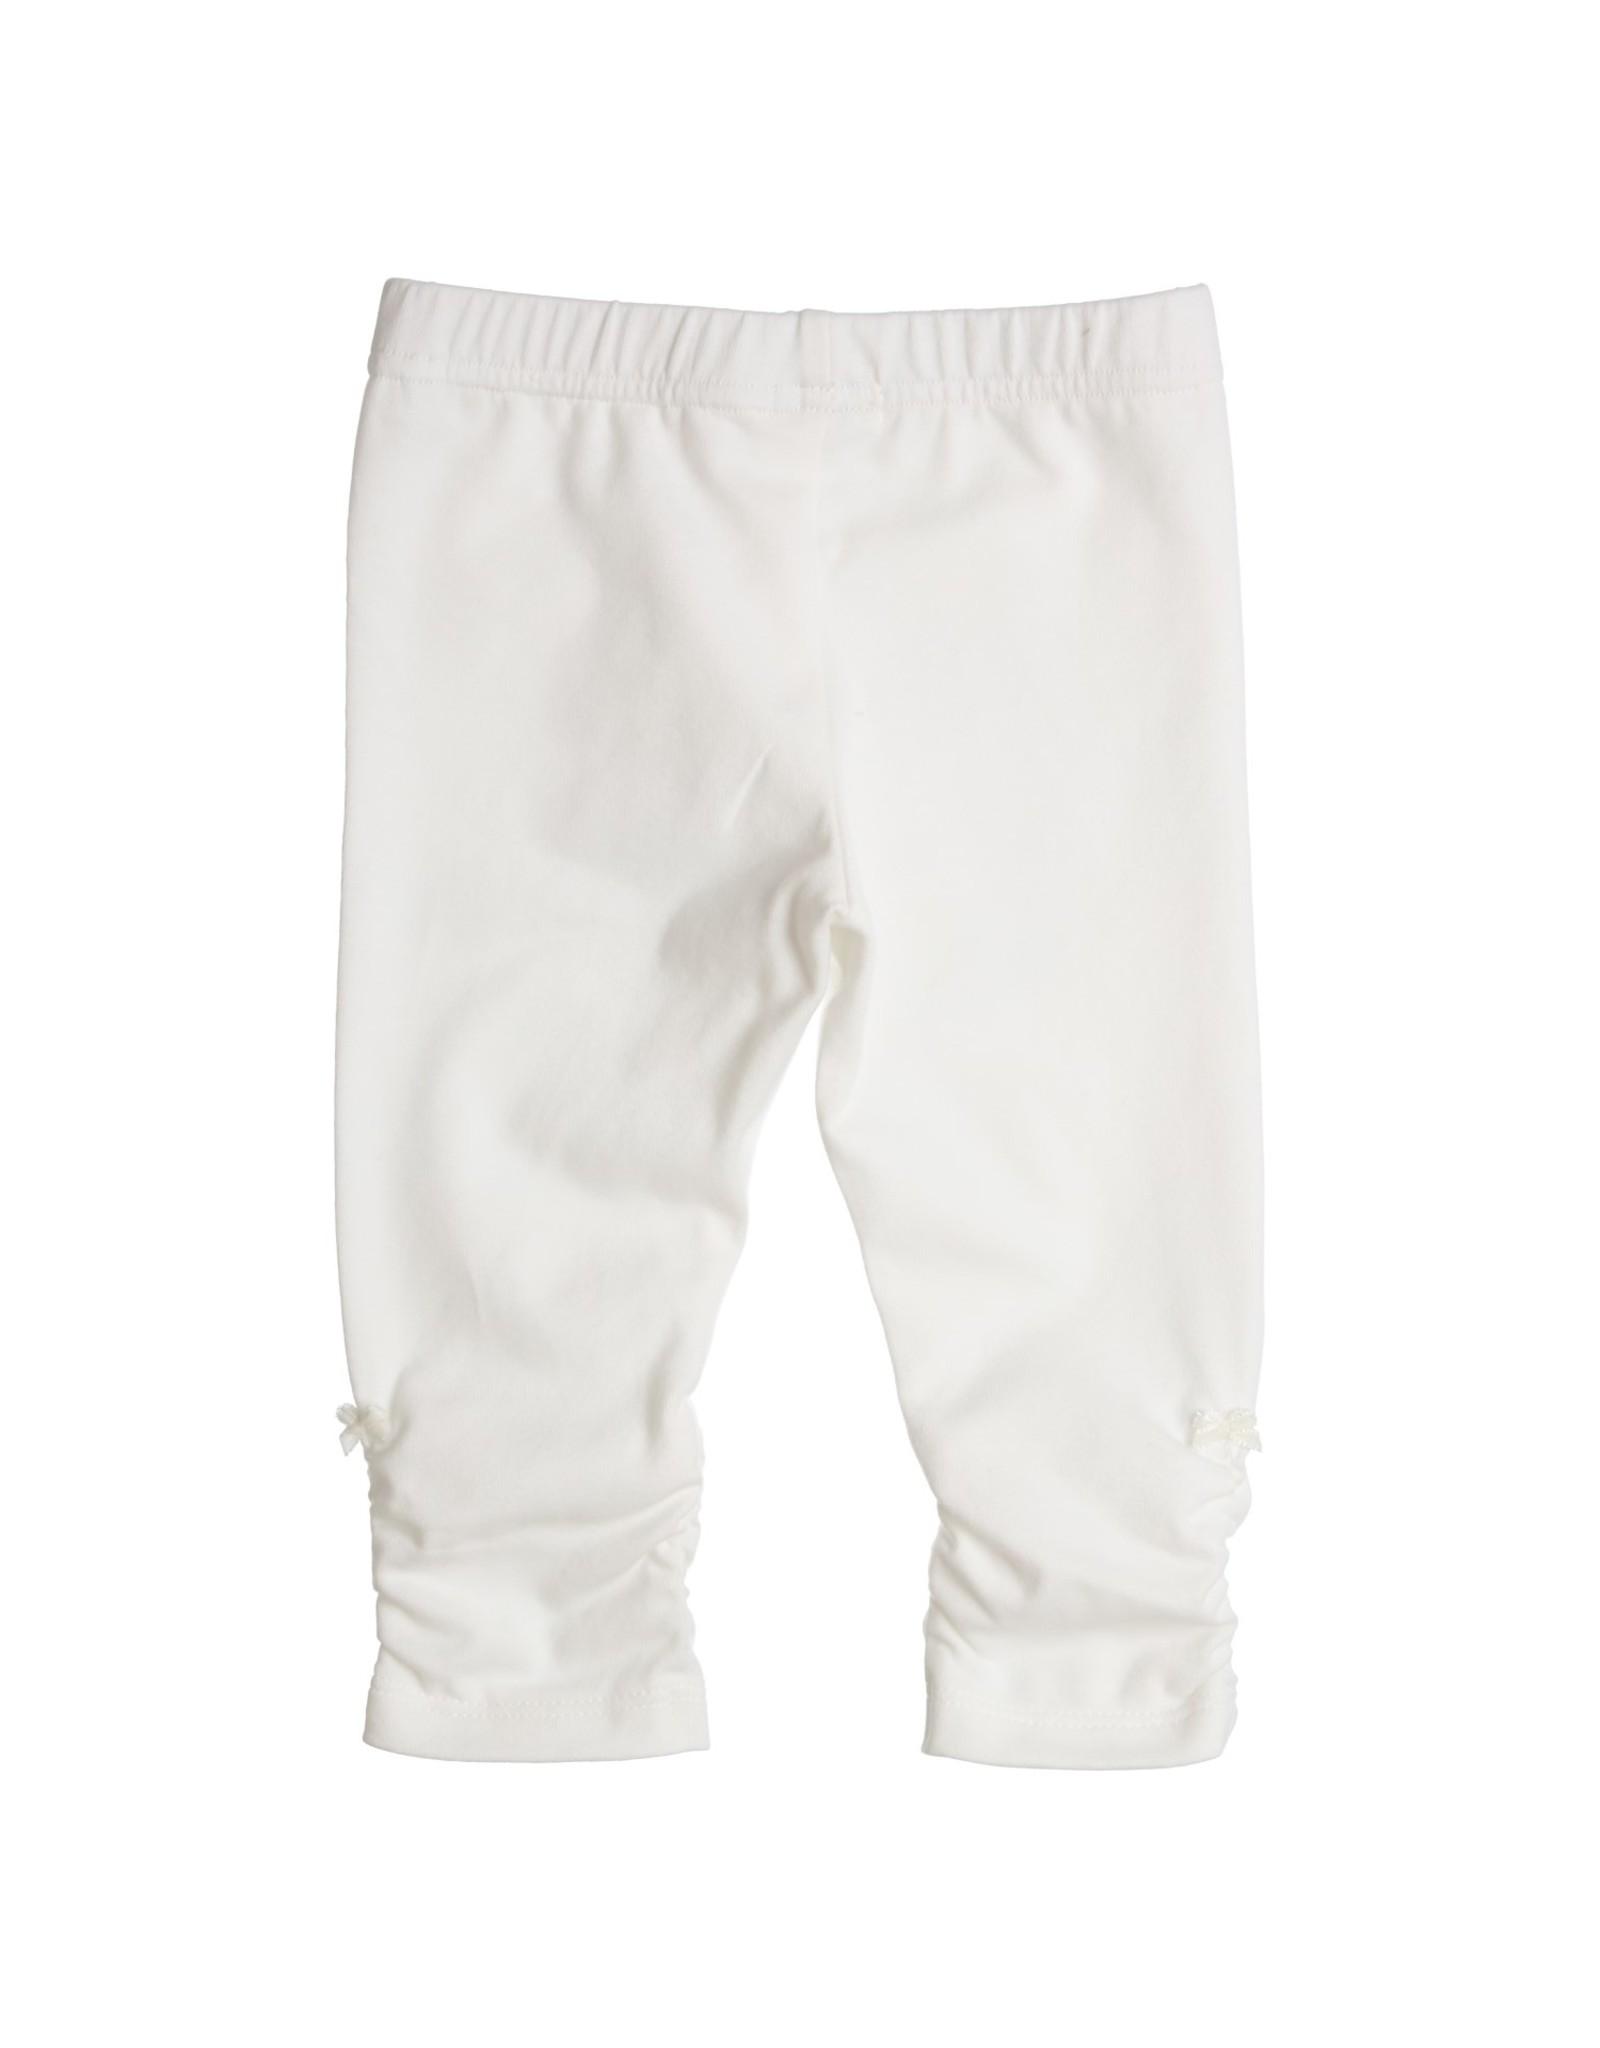 Gymp LEGGING - ELASTIC,  OFF-WHITE